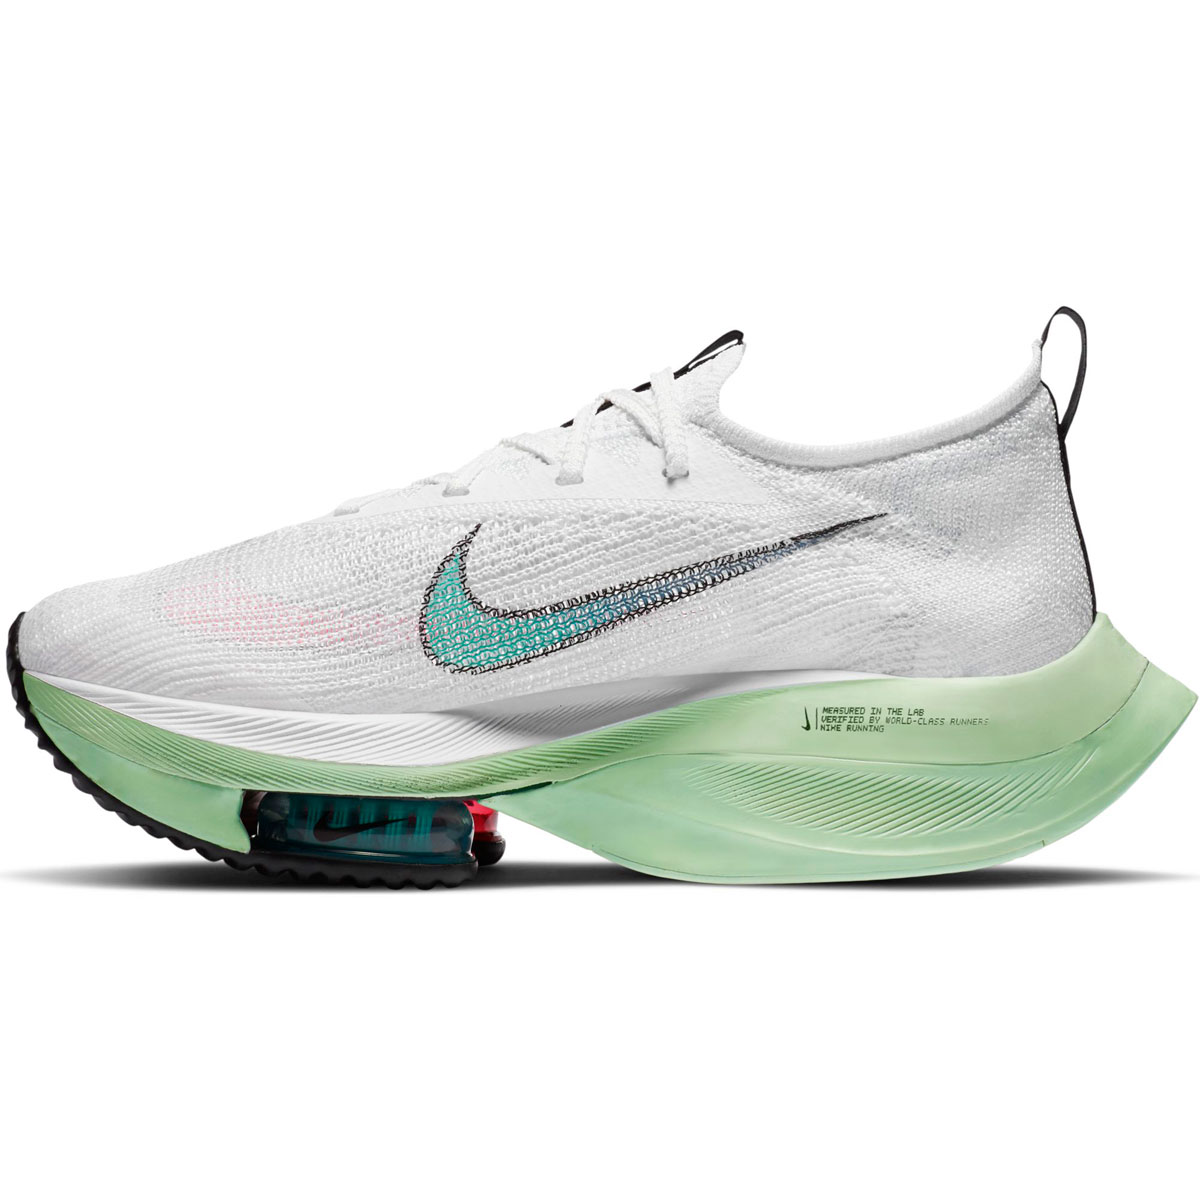 Women's Nike Air Zoom Alphafly Next% Running Shoe - Color: White/Flash Crimson/Jade Aura - Size: 5 - Width: Regular, White/Flash Crimson/Jade Aura, large, image 2